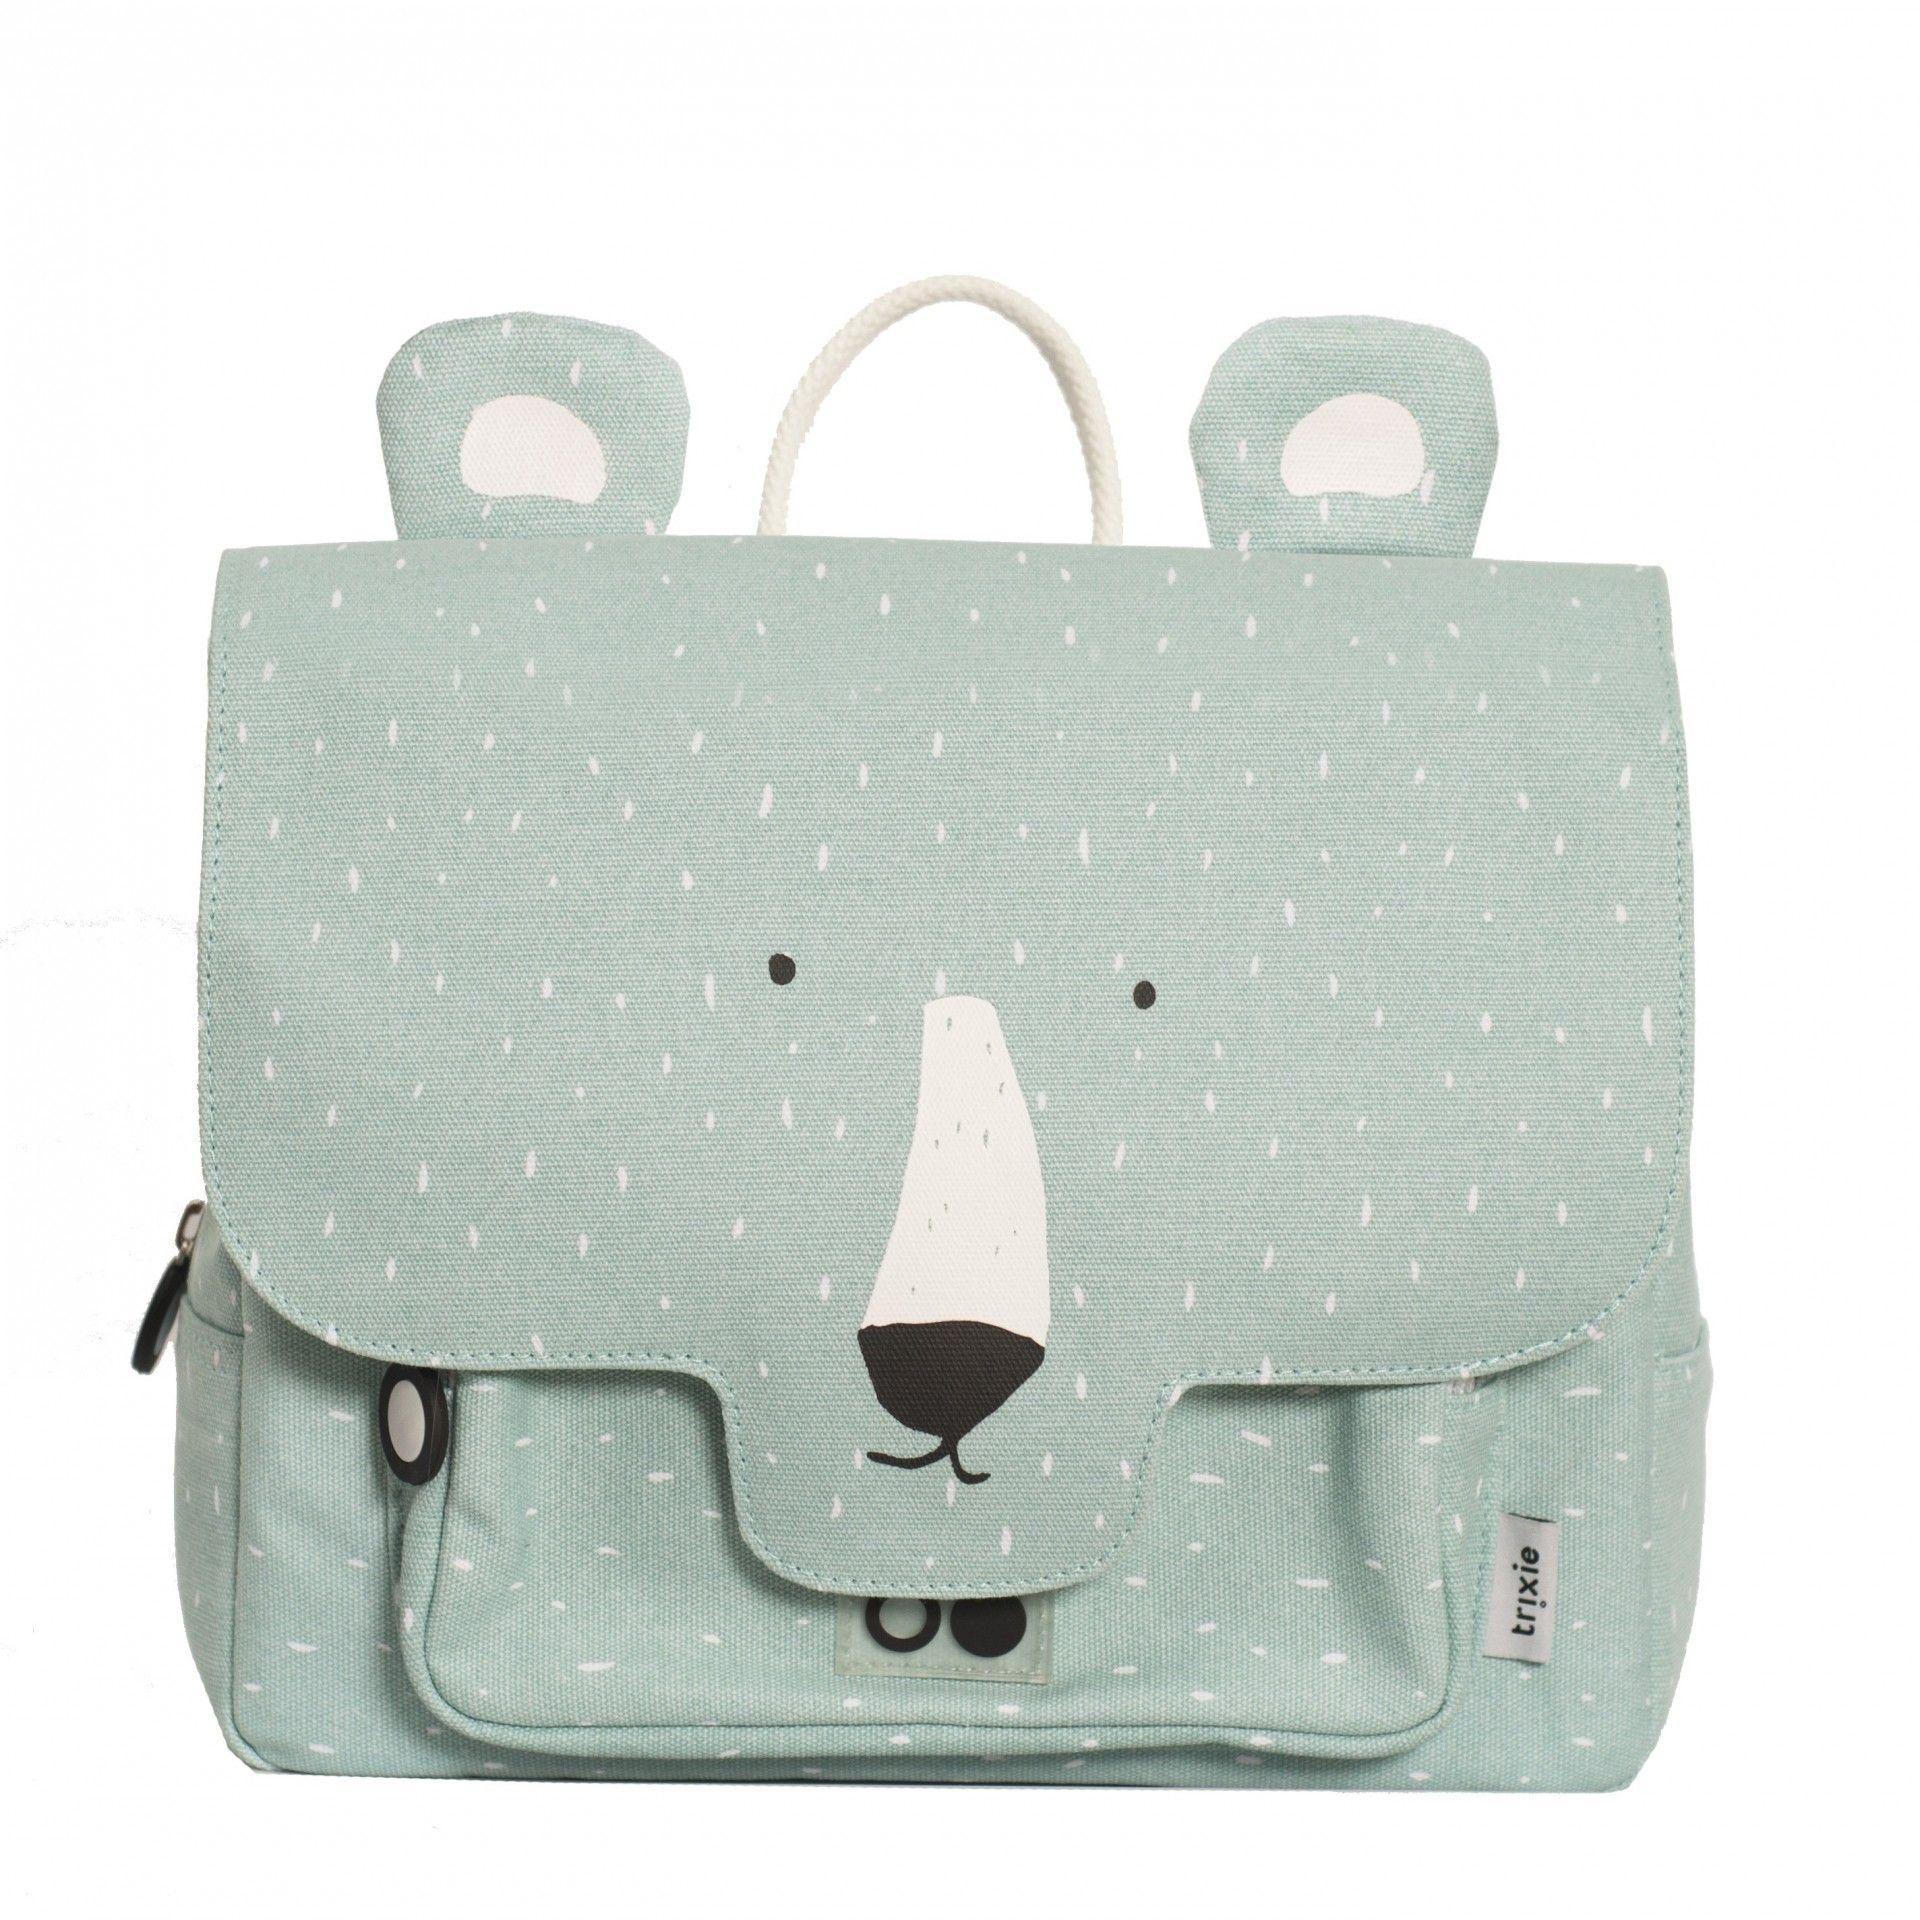 978a42e5c8 Υπέροχη τσάντα πλάτης ιδανική για τους μικρούς μας φίλους. Έχει δύο θήκες